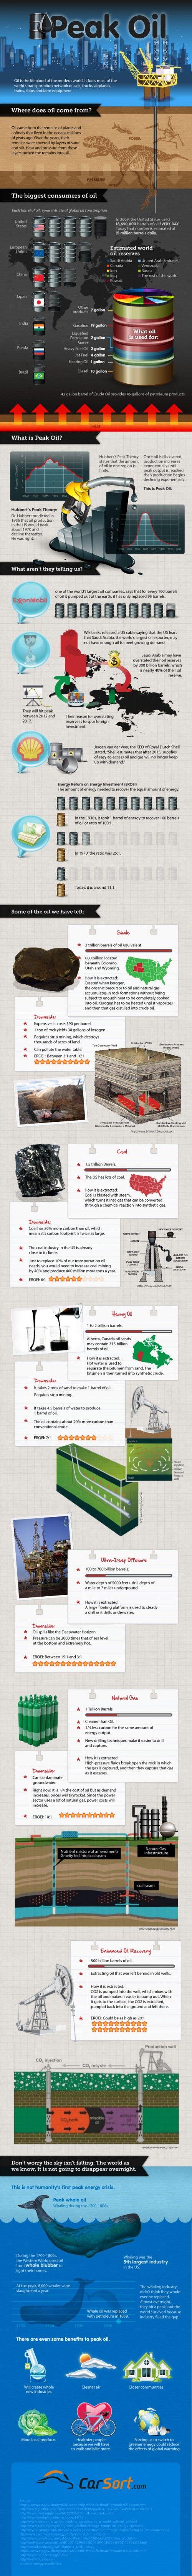 Oil & Peak Oil Infographic